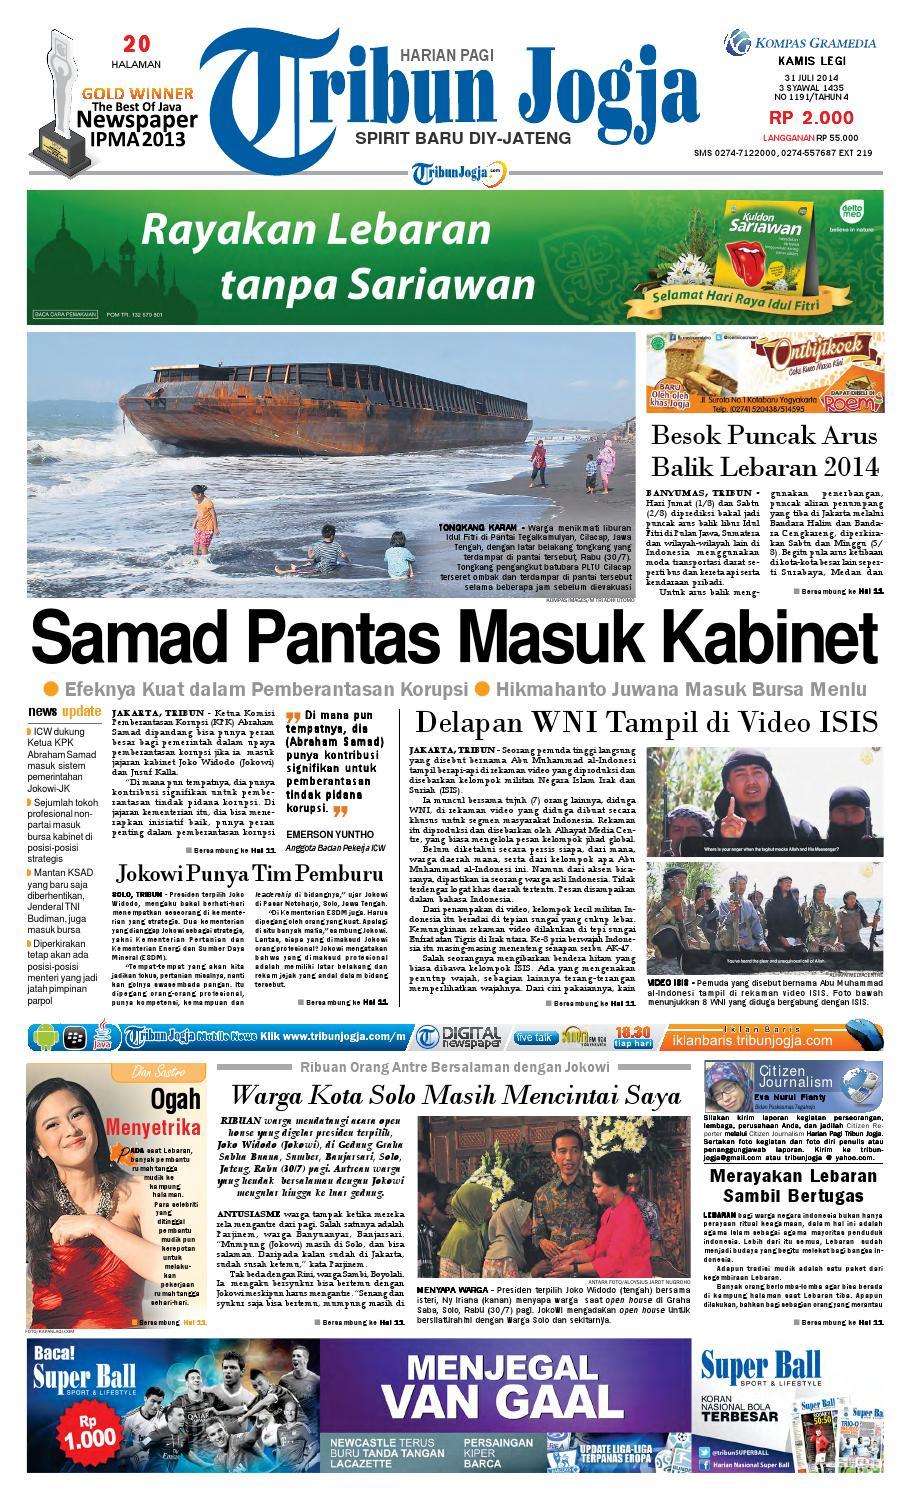 Tribunjogja 31 07 2014 By Tribun Jogja Issuu Produk Ukm Bumn Wisata Mewah Bali 3hr 2mlm